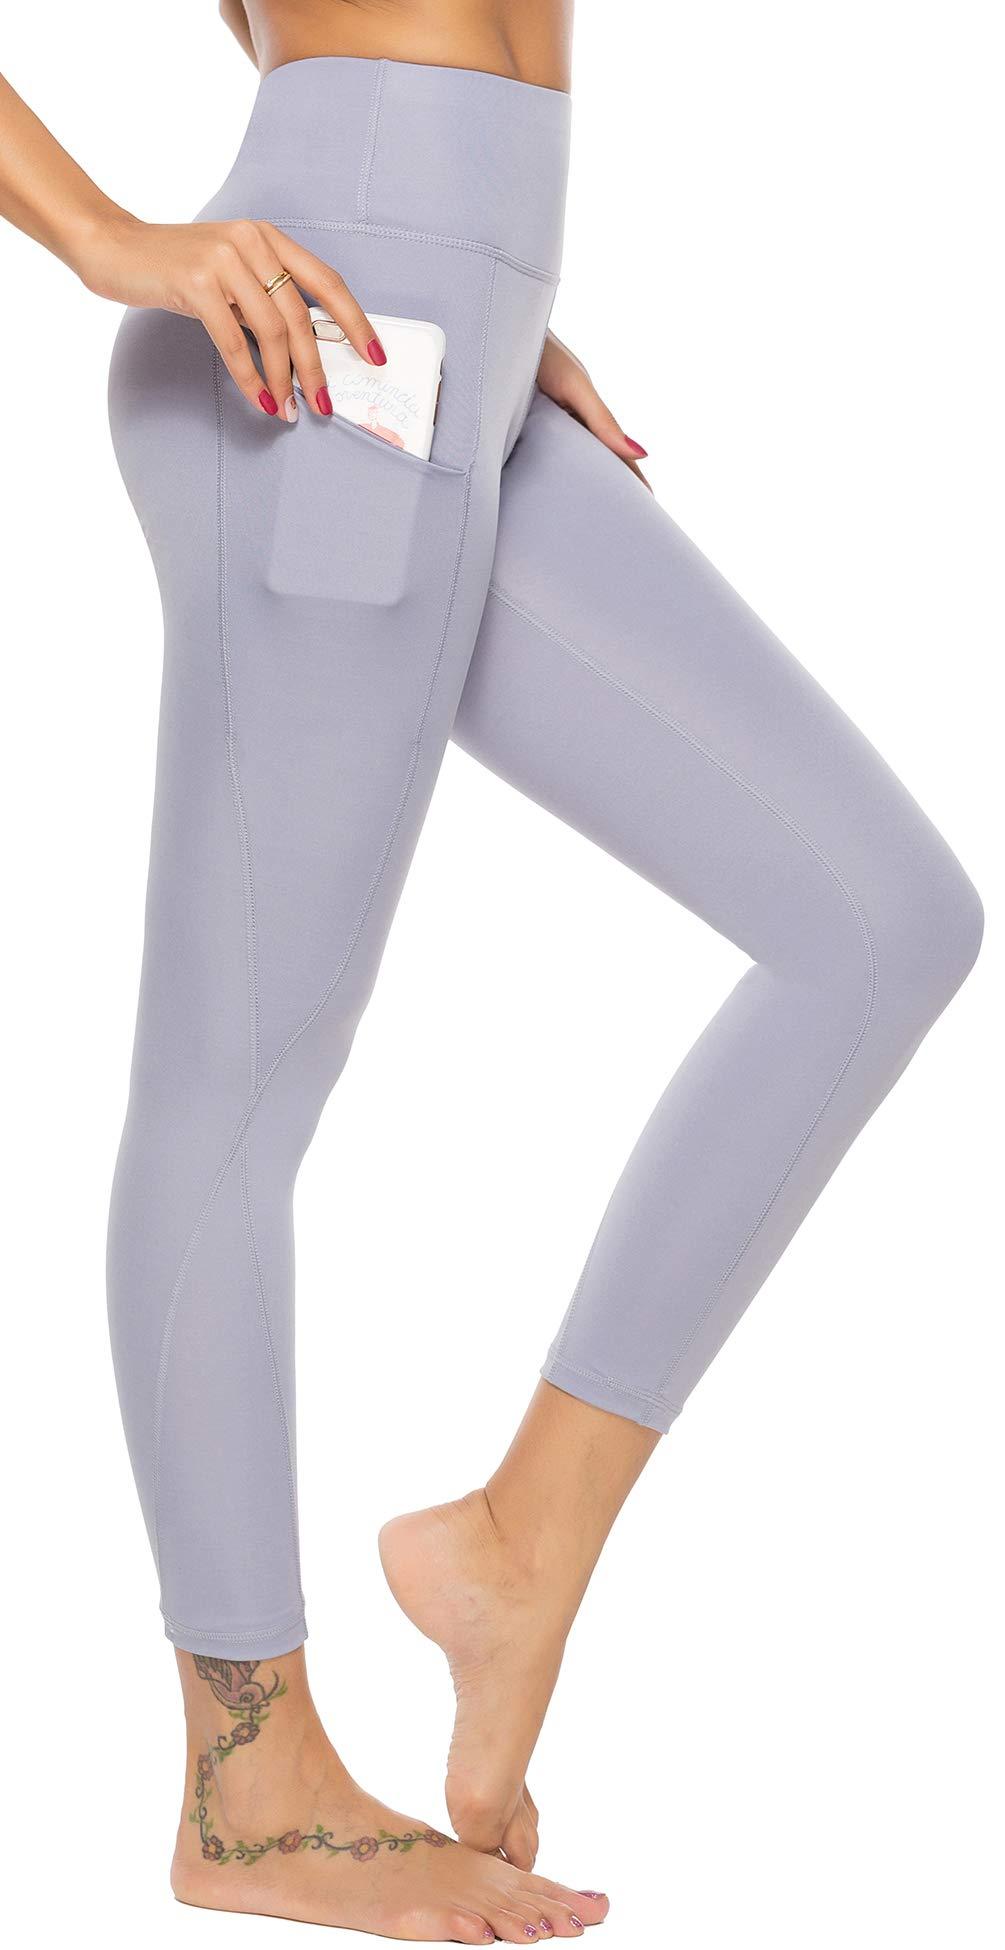 AUU High Waist Out Pocket Yoga Pants Tummy Control Workout Running 4 Way Stretch Capris Leggings